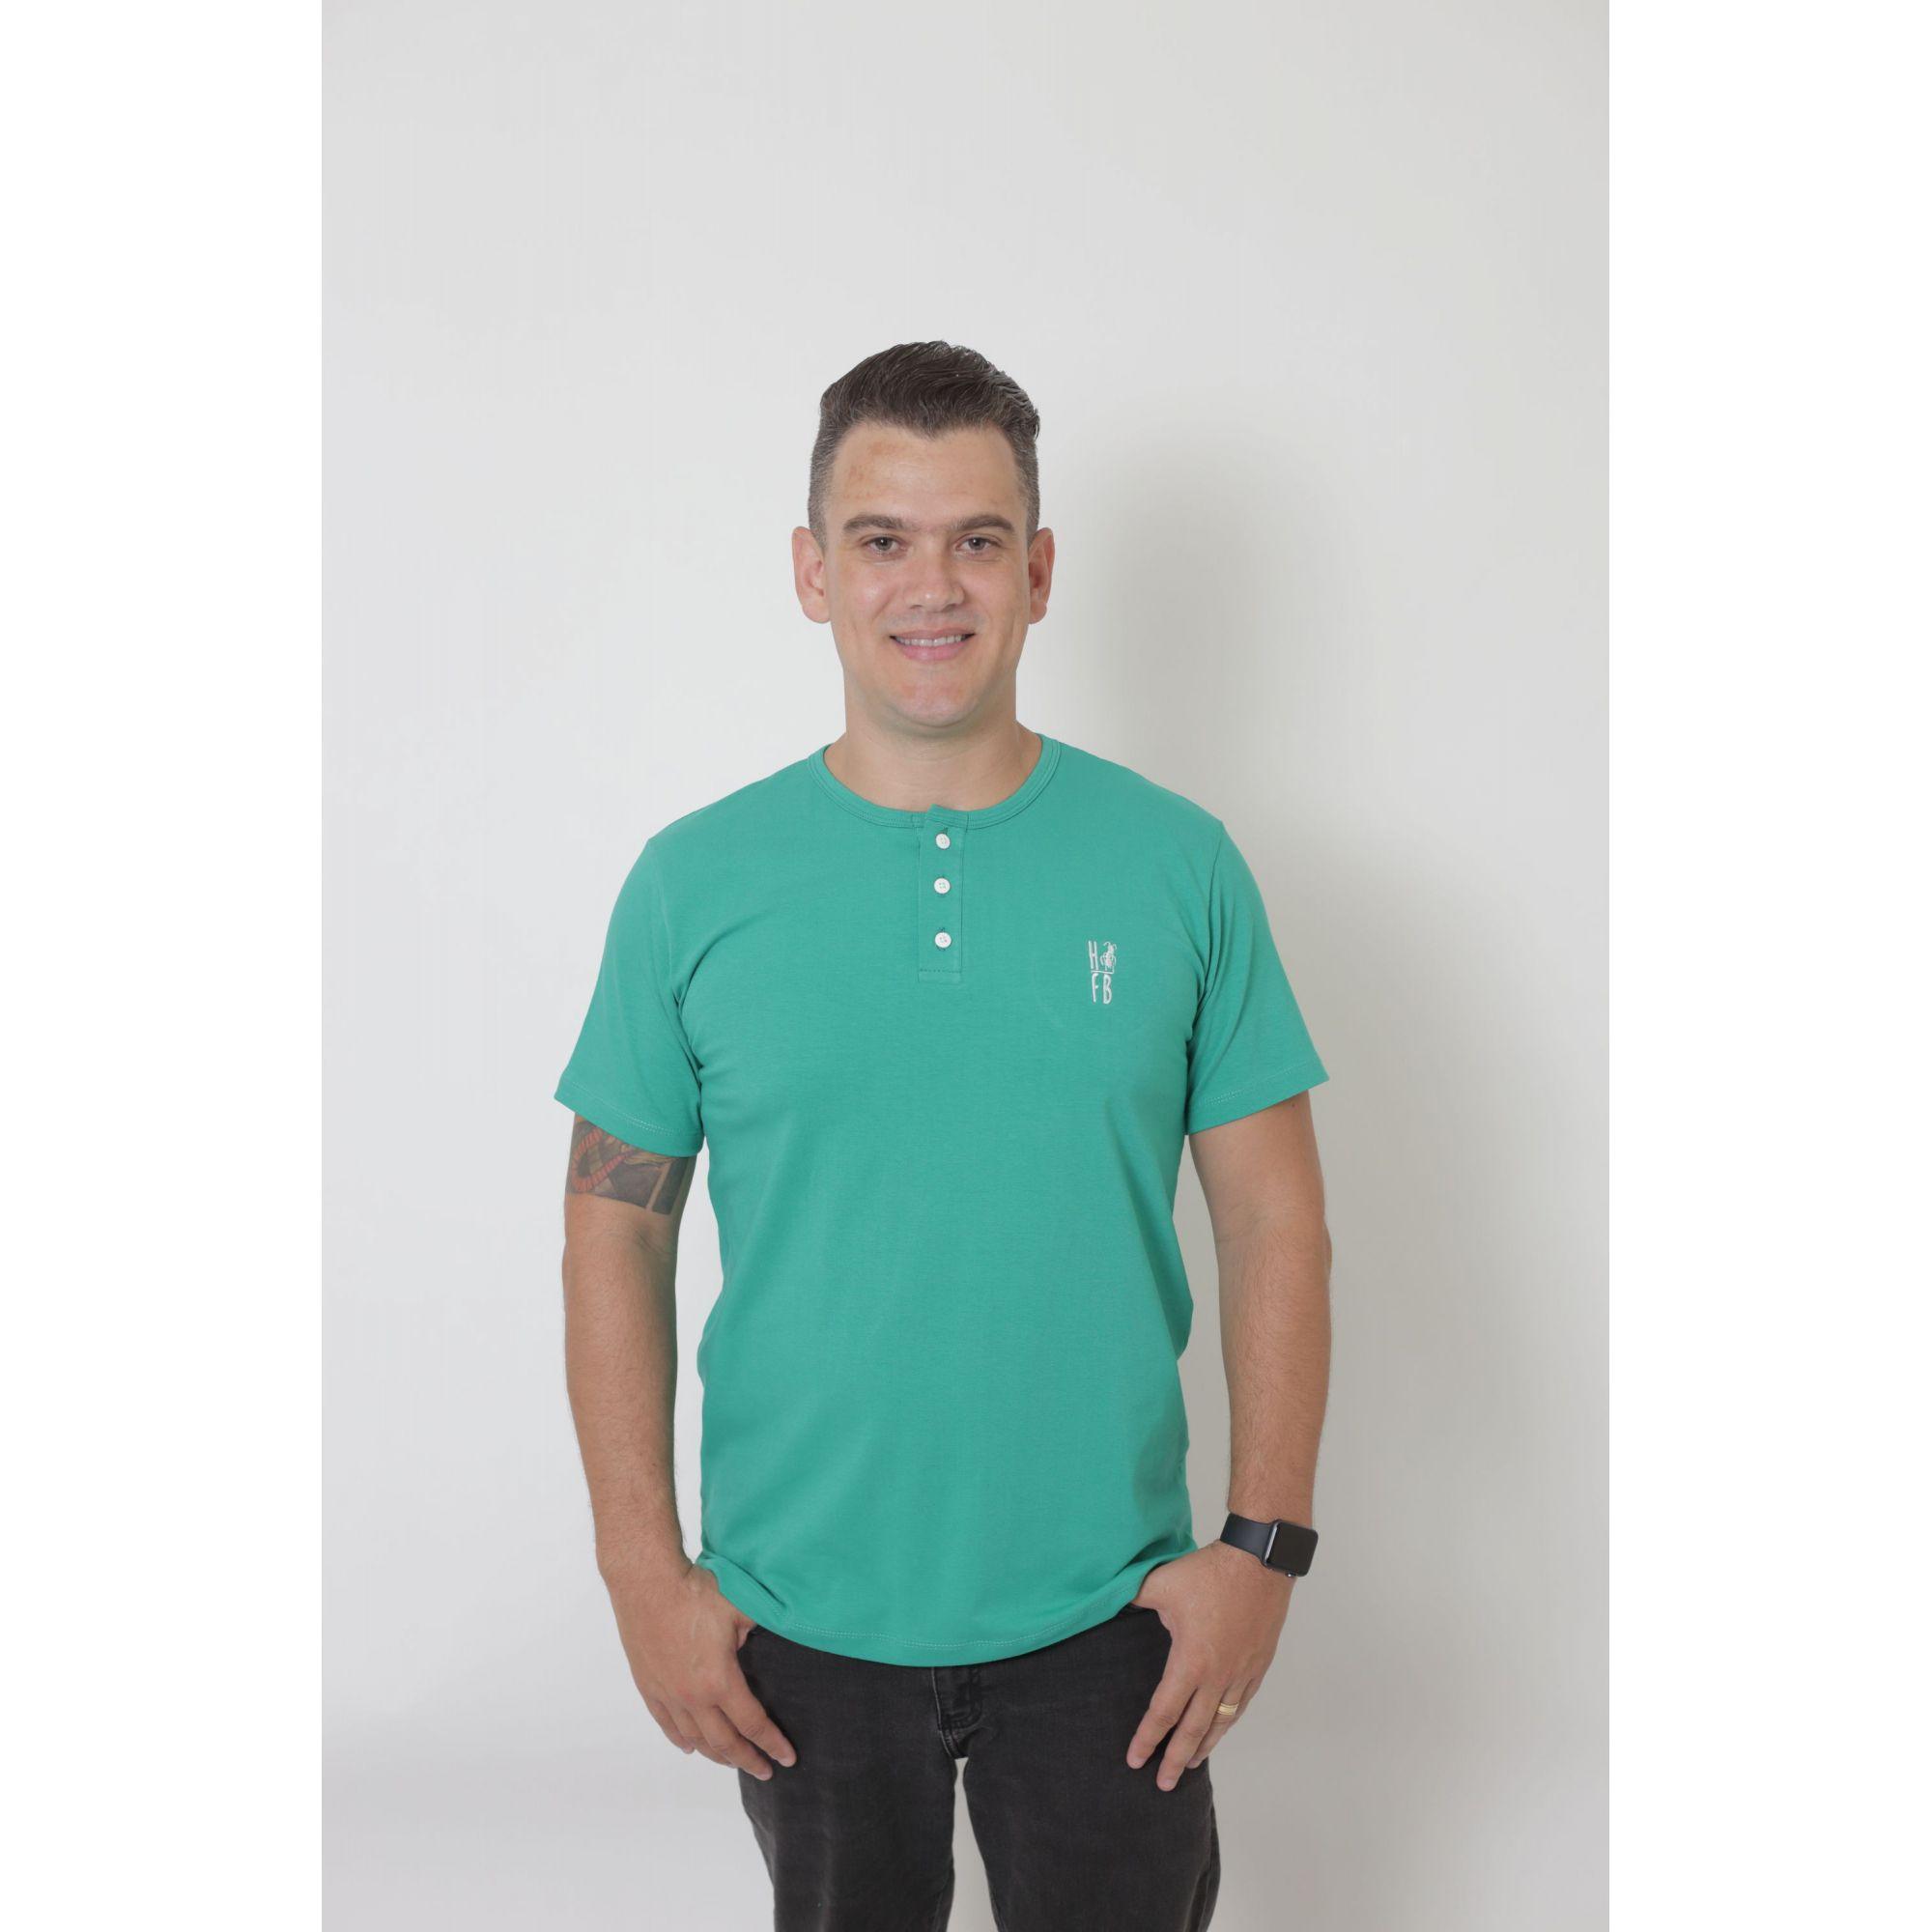 T-Shirt Henley Masculina Verde Jade   - Heitor Fashion Brazil